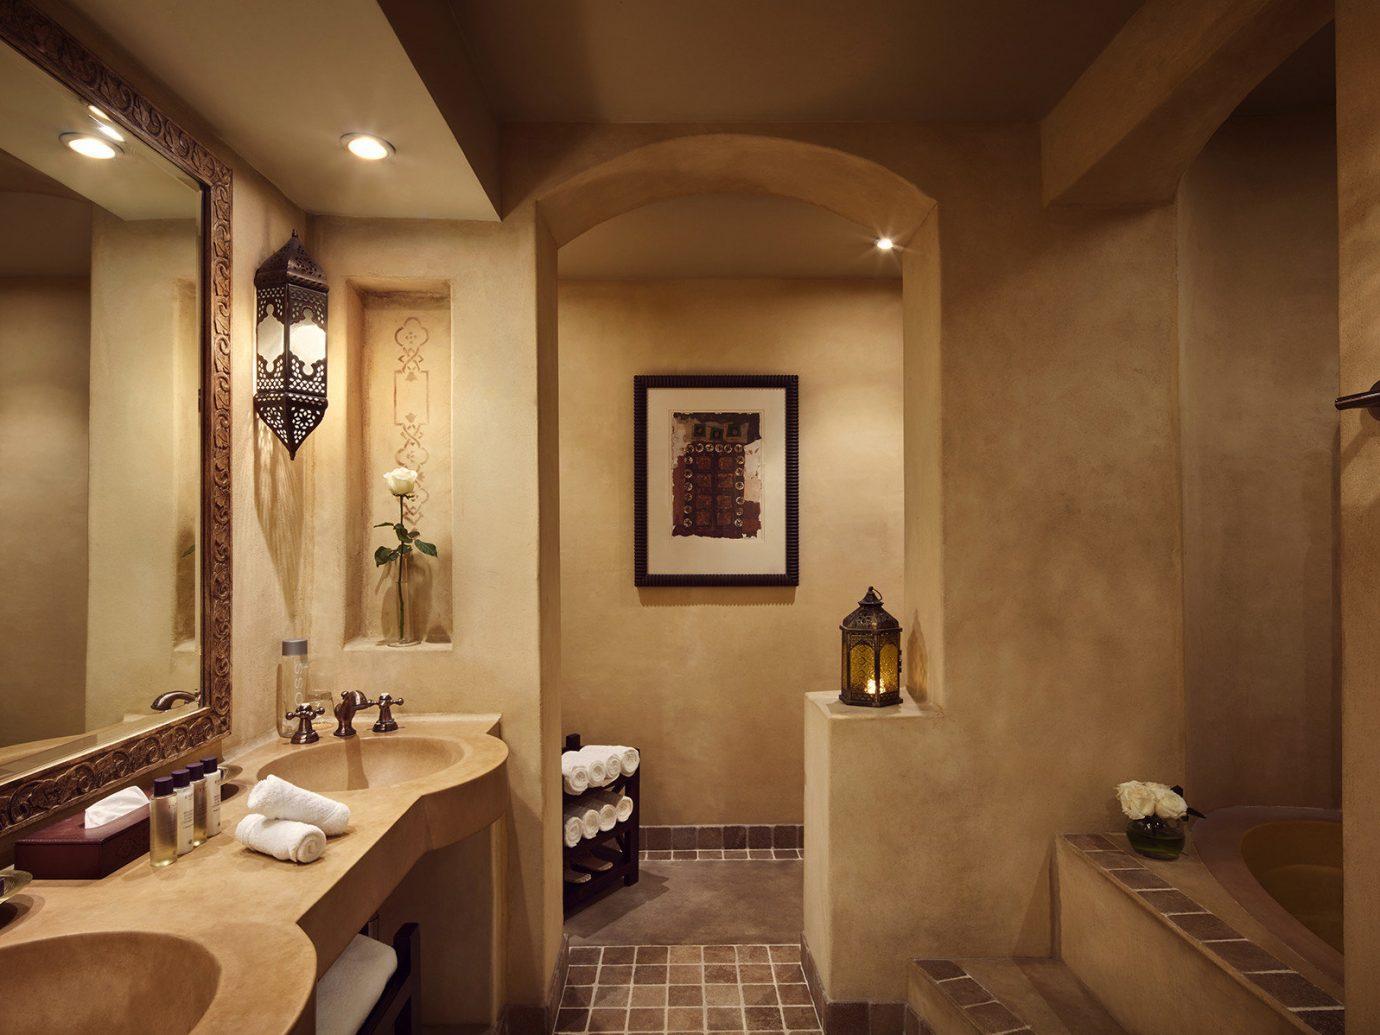 Dubai Hotels Luxury Travel Middle East indoor wall bathroom mirror ceiling room sink interior design toilet flooring estate floor Suite